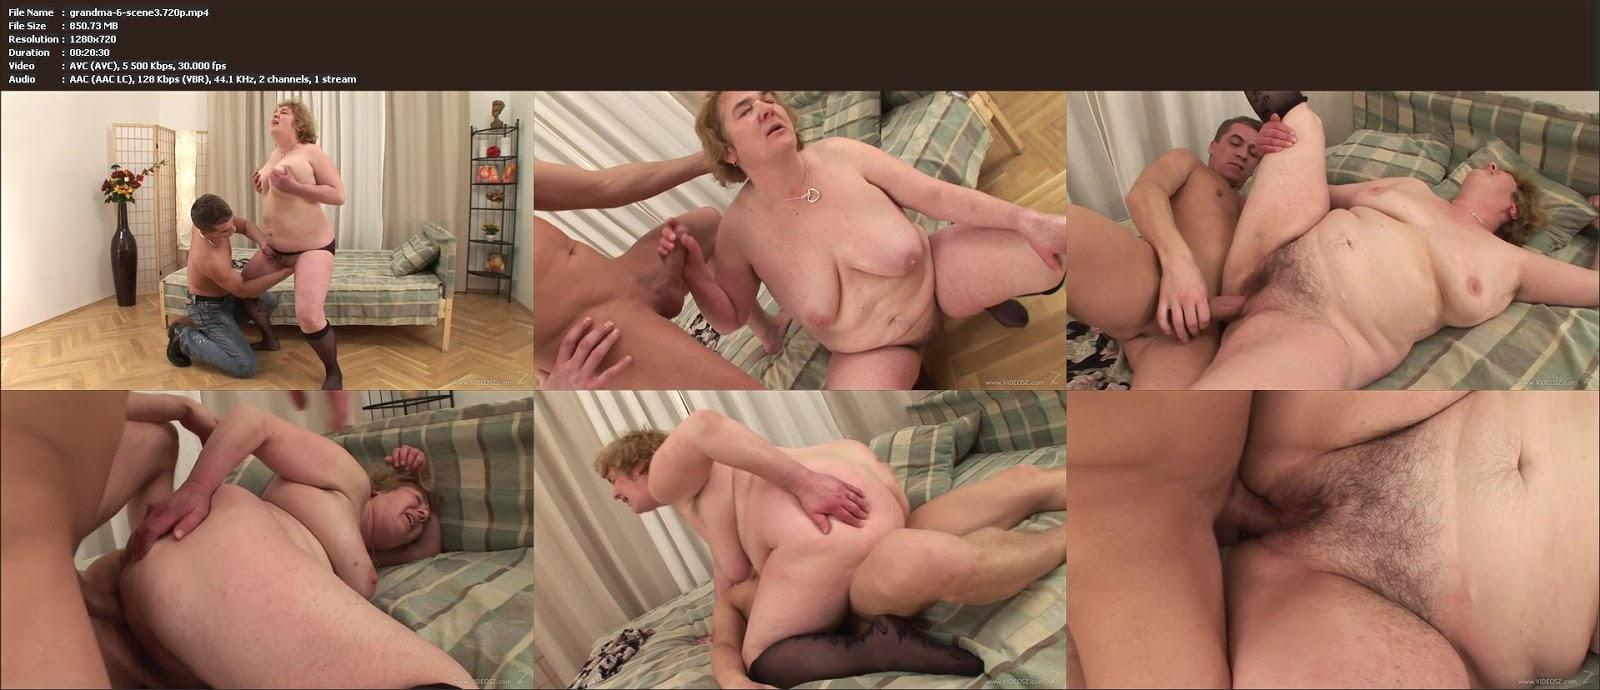 granny sexe le sexe chinois